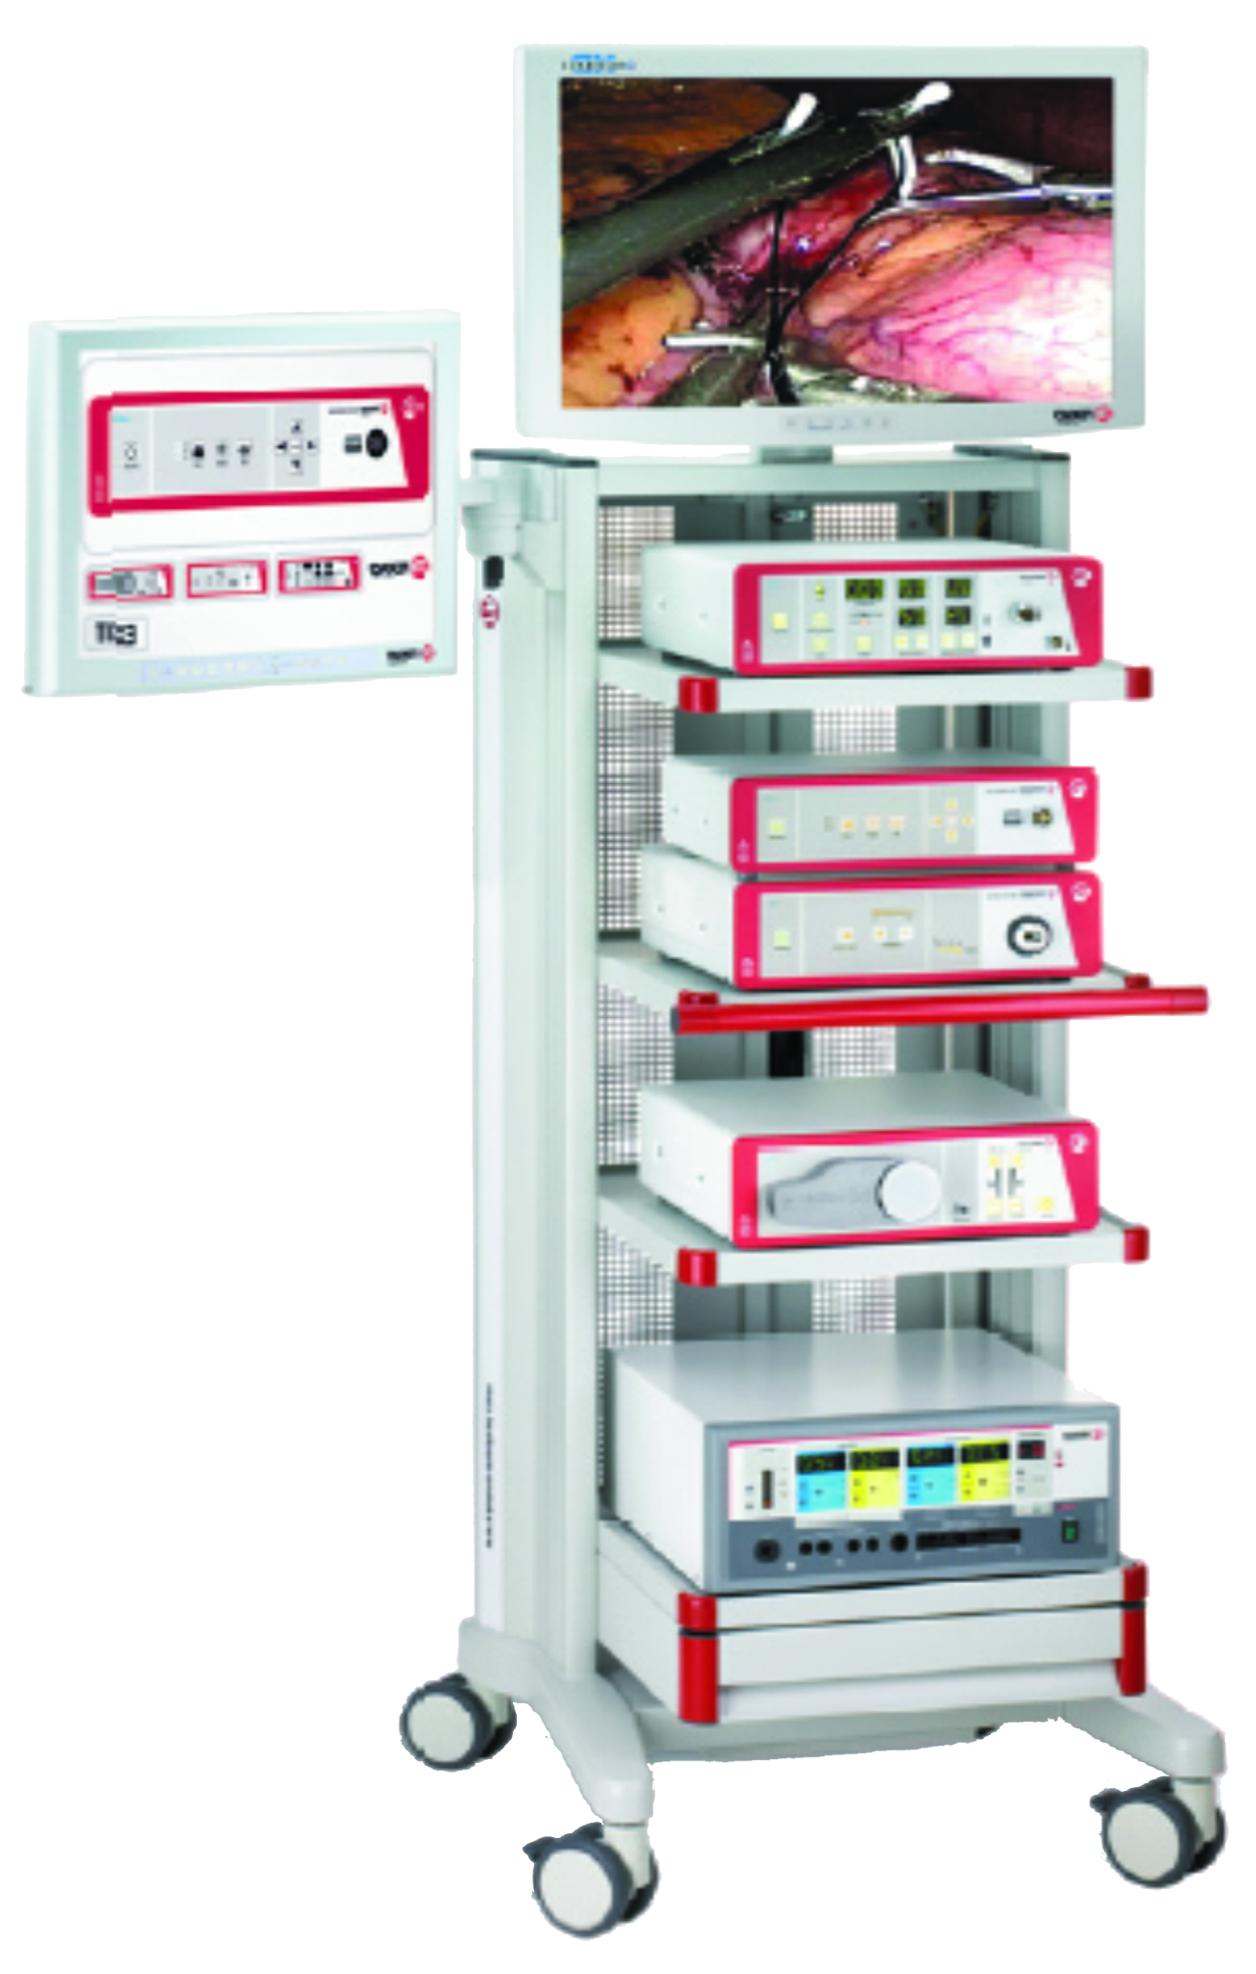 Endoscopy Unit: تجهیزات پزشکی خرید و فروش یونیت